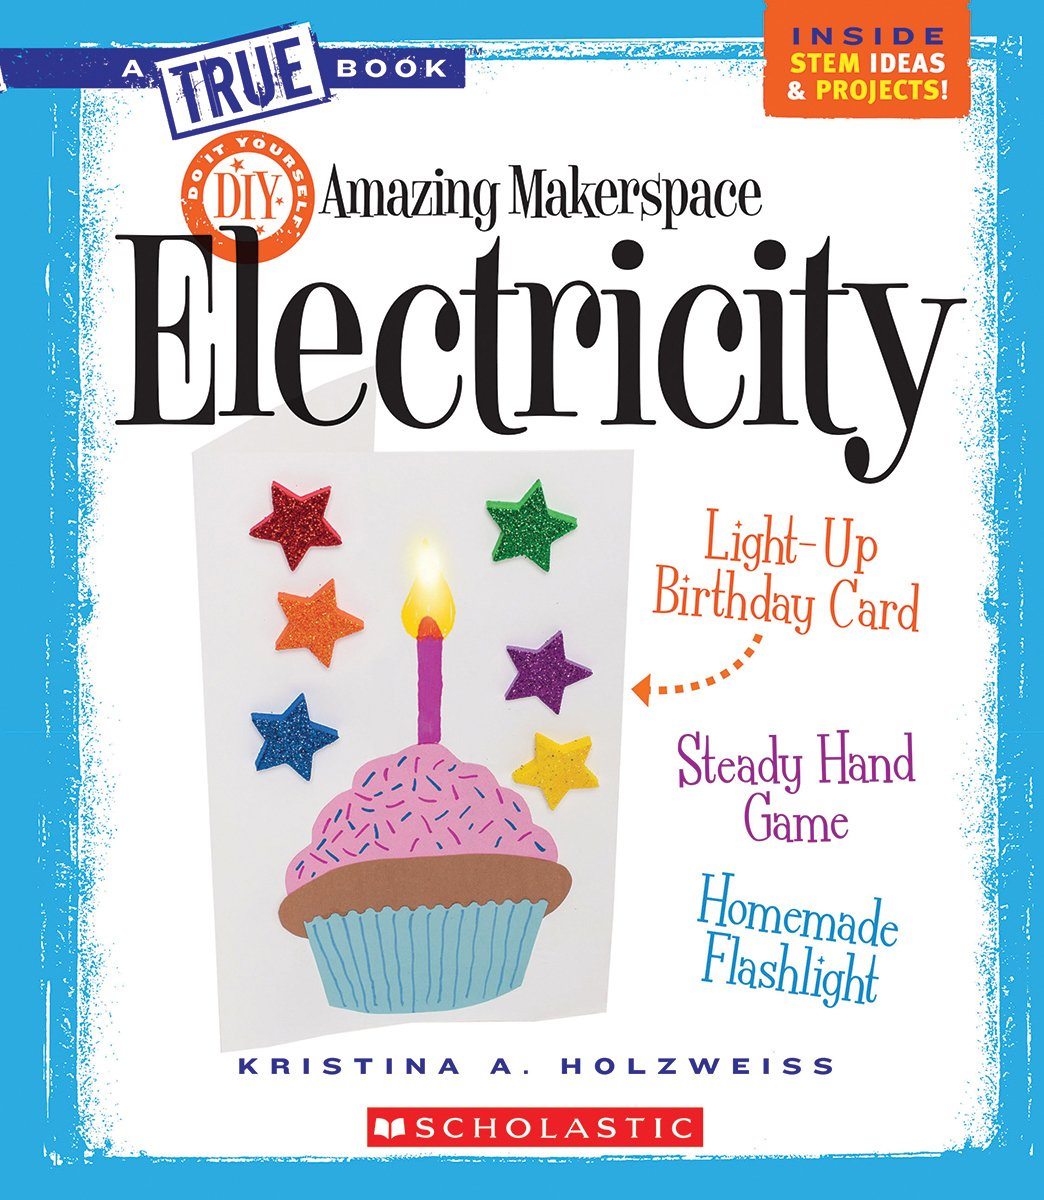 Amazing Makerspace DIY Electricity (True Books) (True Books: Amazing Makerspace DIY) PDF